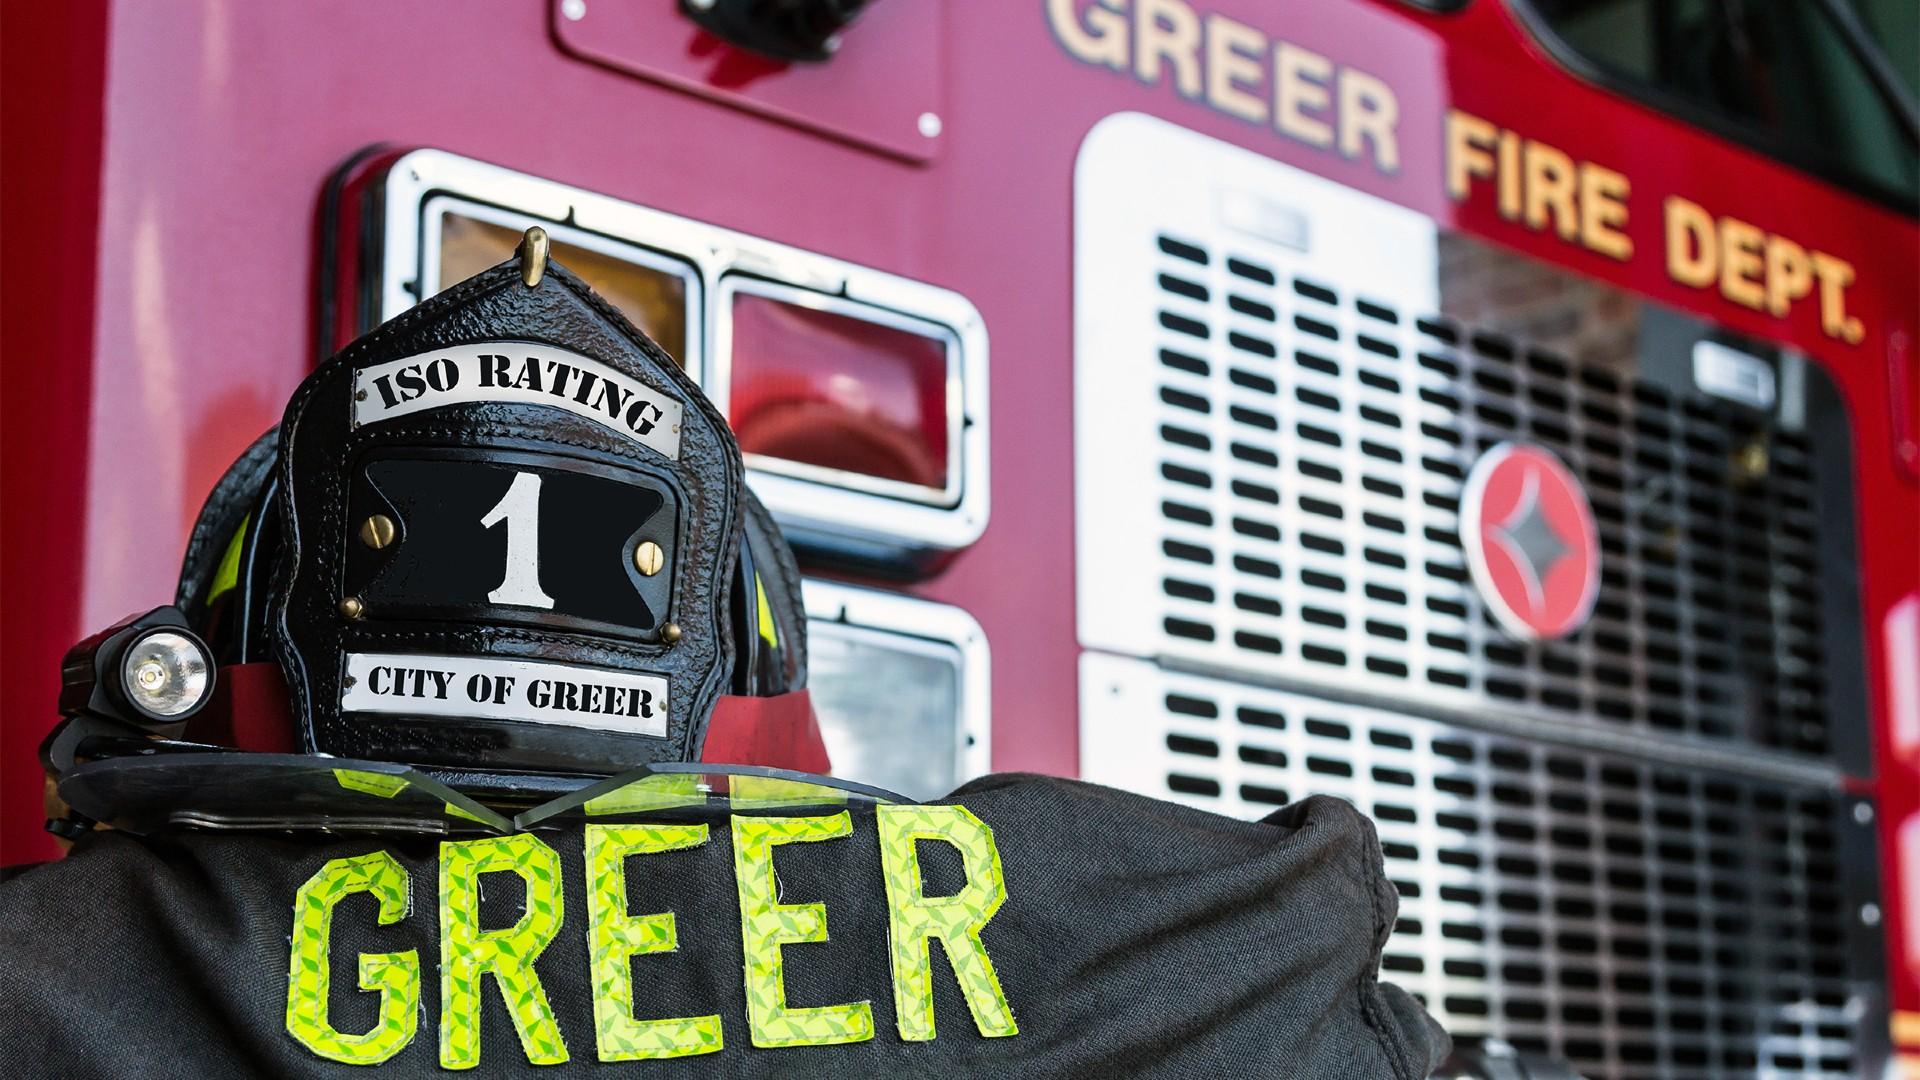 greer fire truck